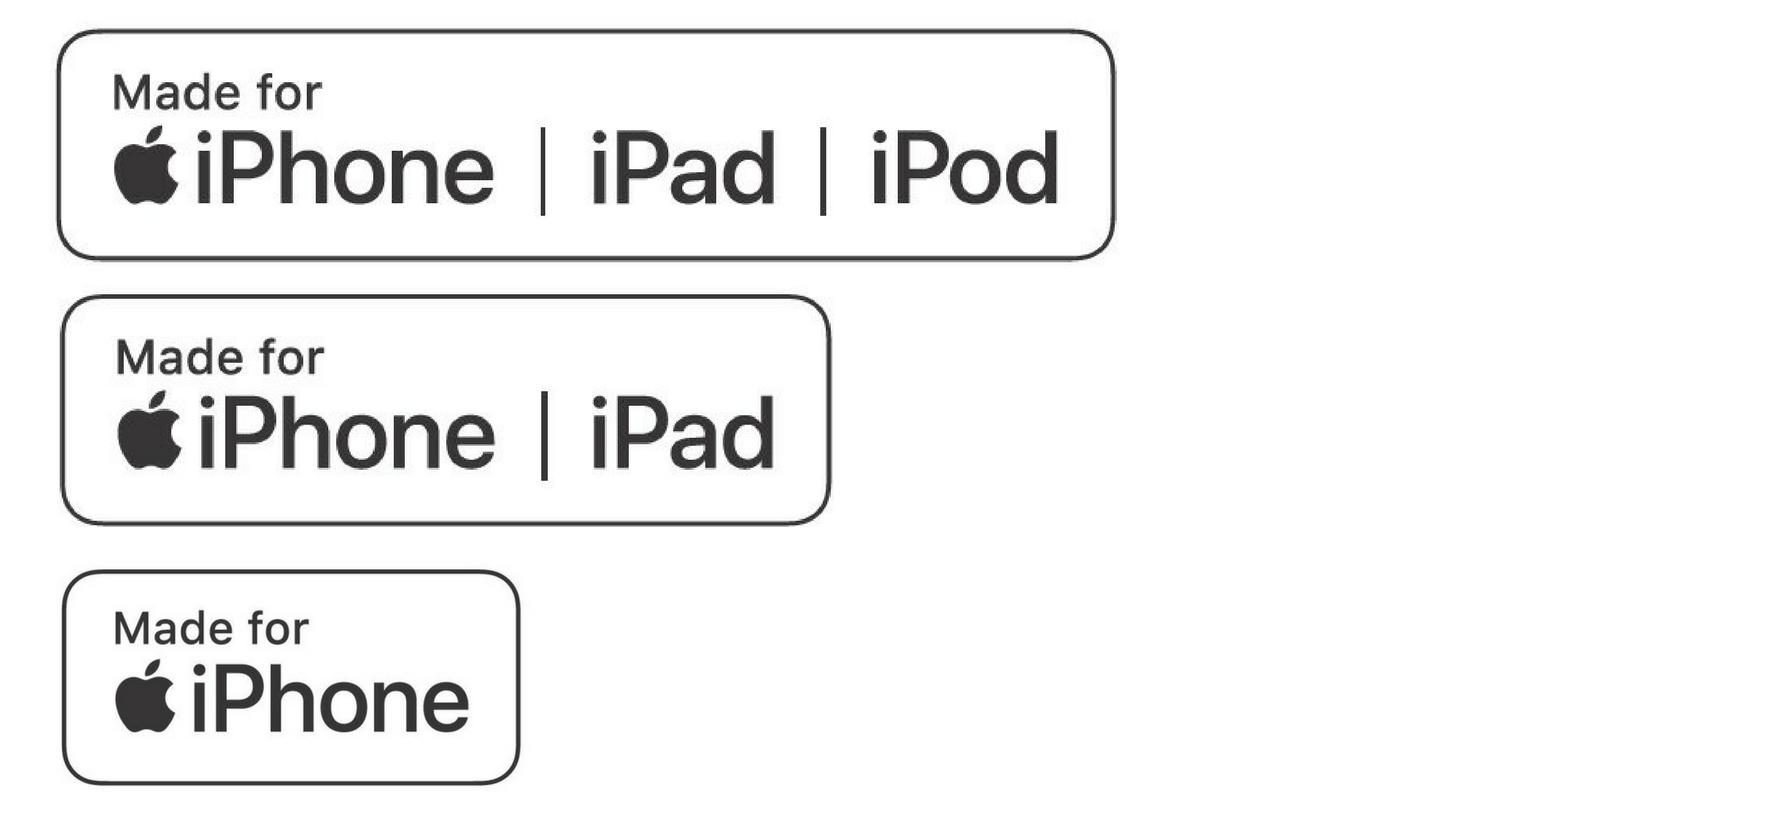 Made-for-iPhone (FMi) | Via Apple.